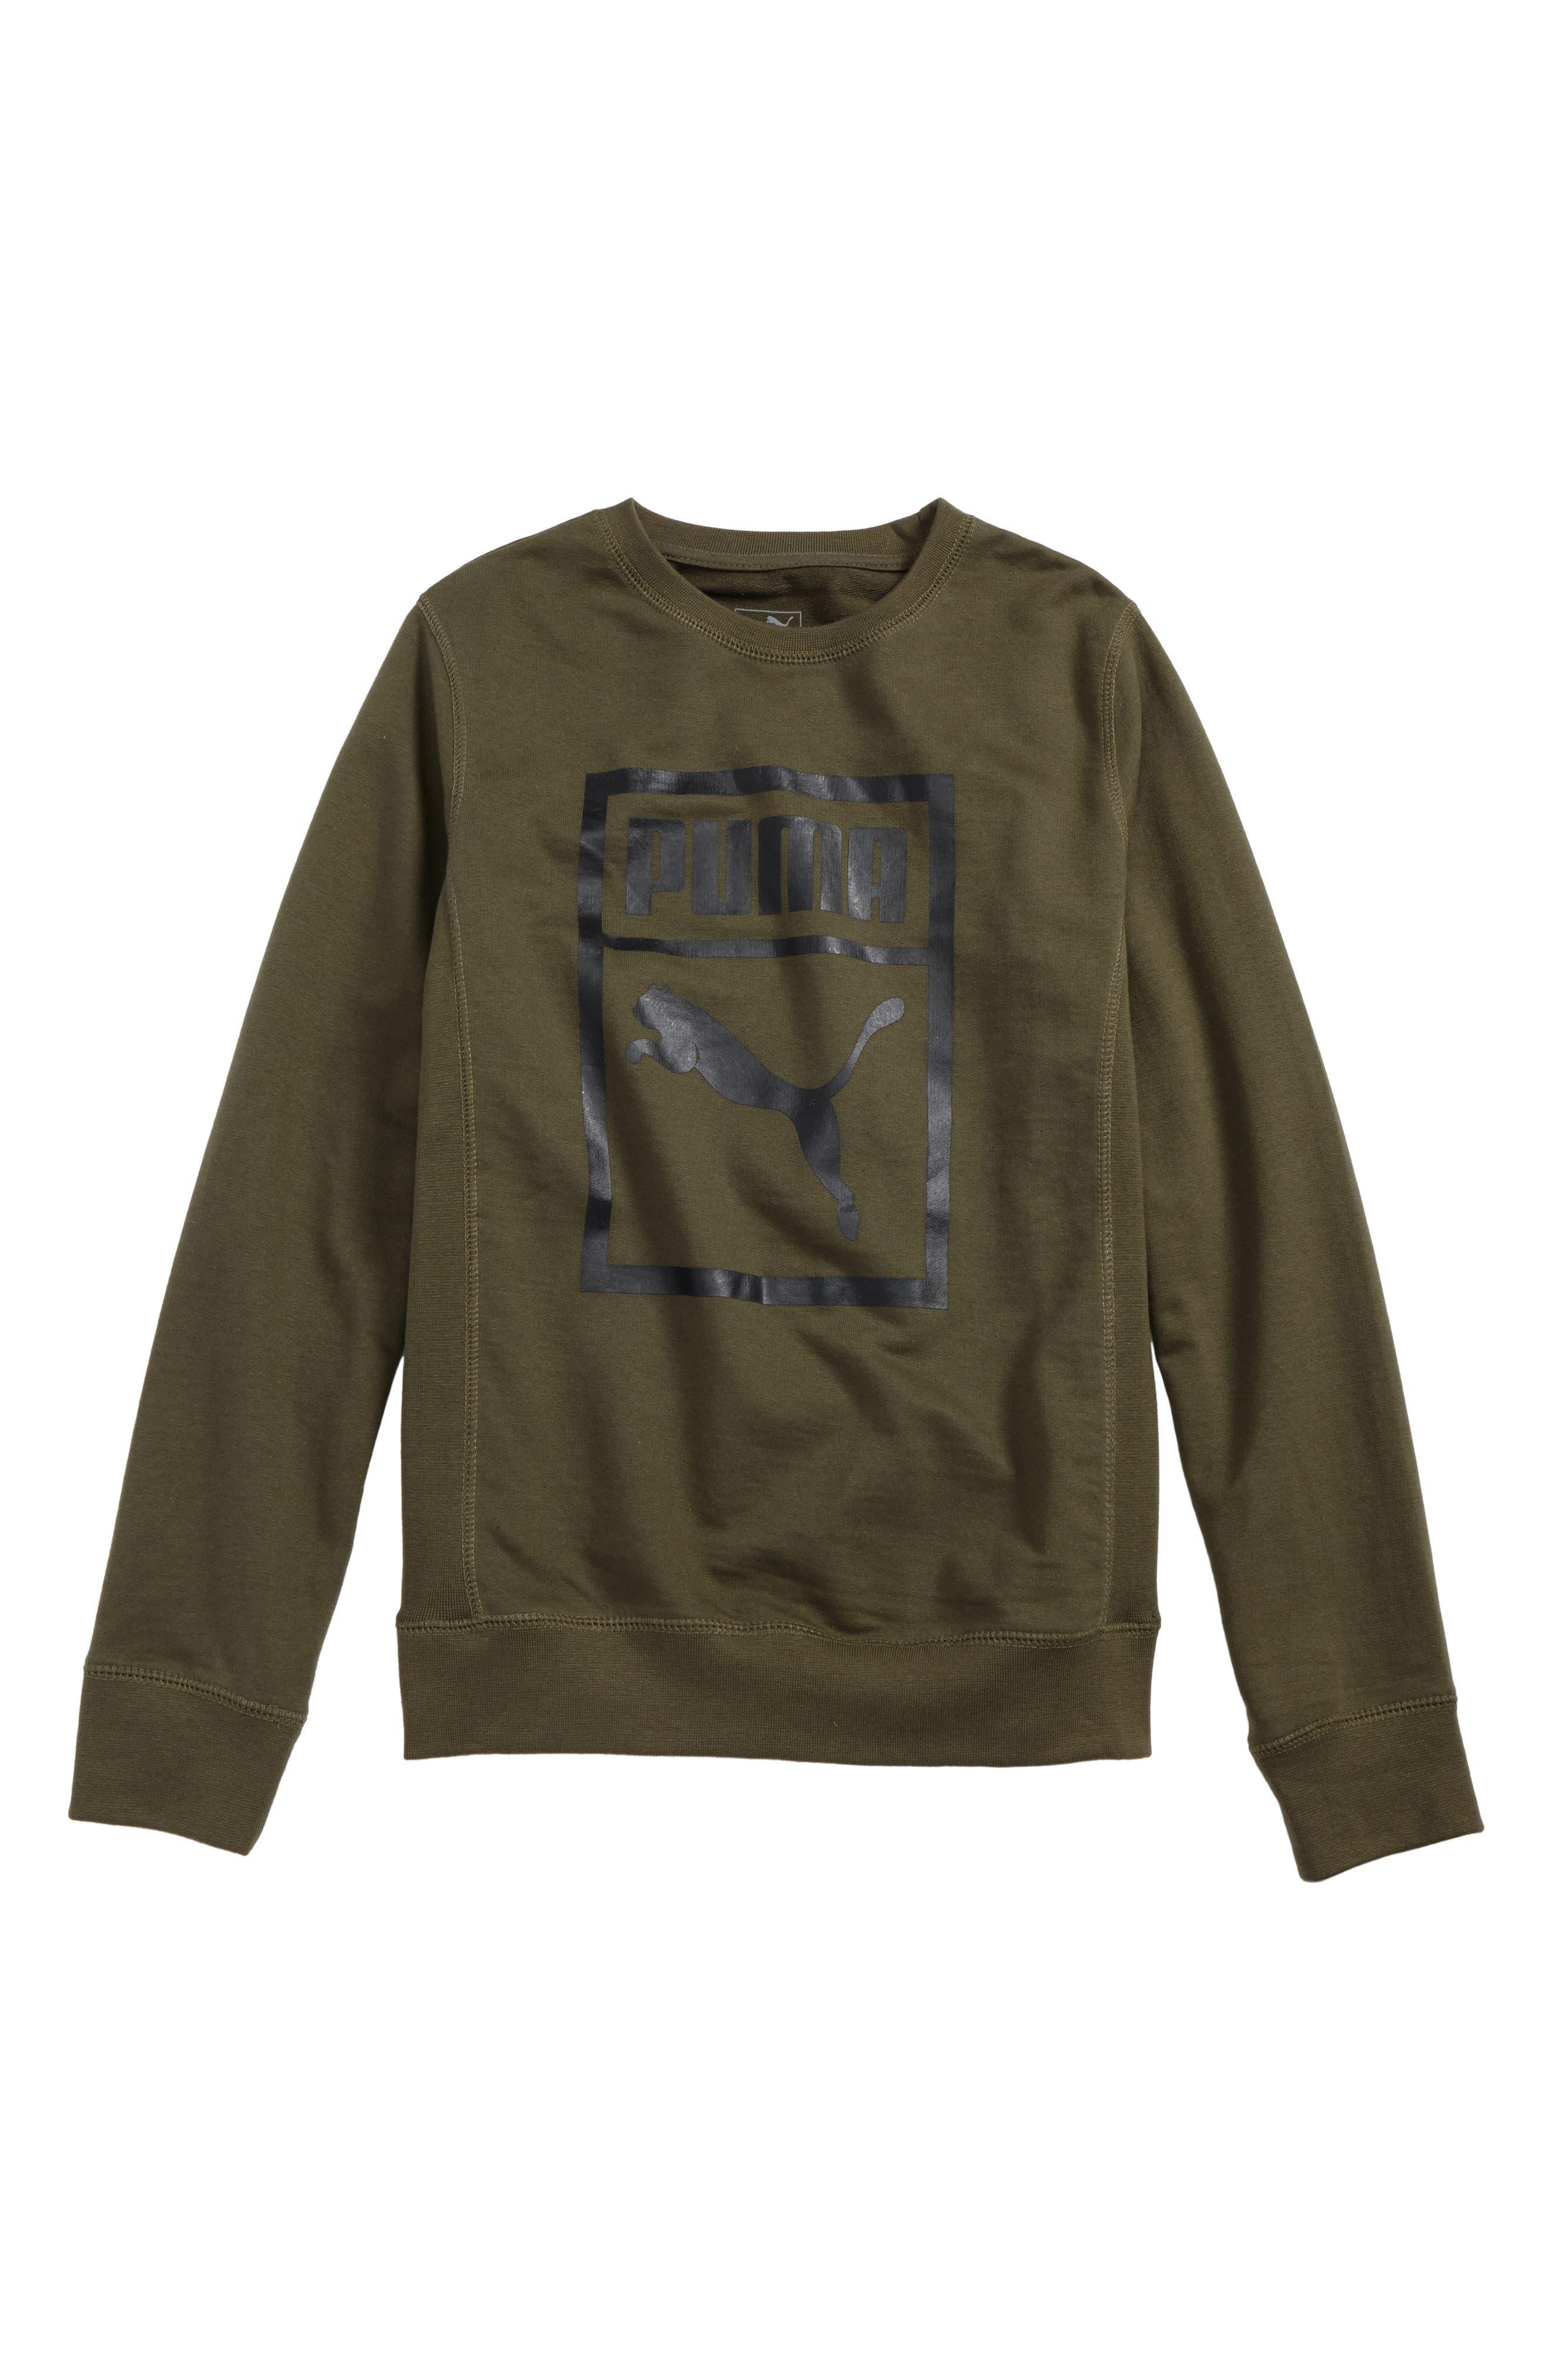 Main Image - Puma Heritage Crewneck Sweatshirt (Big Boys)